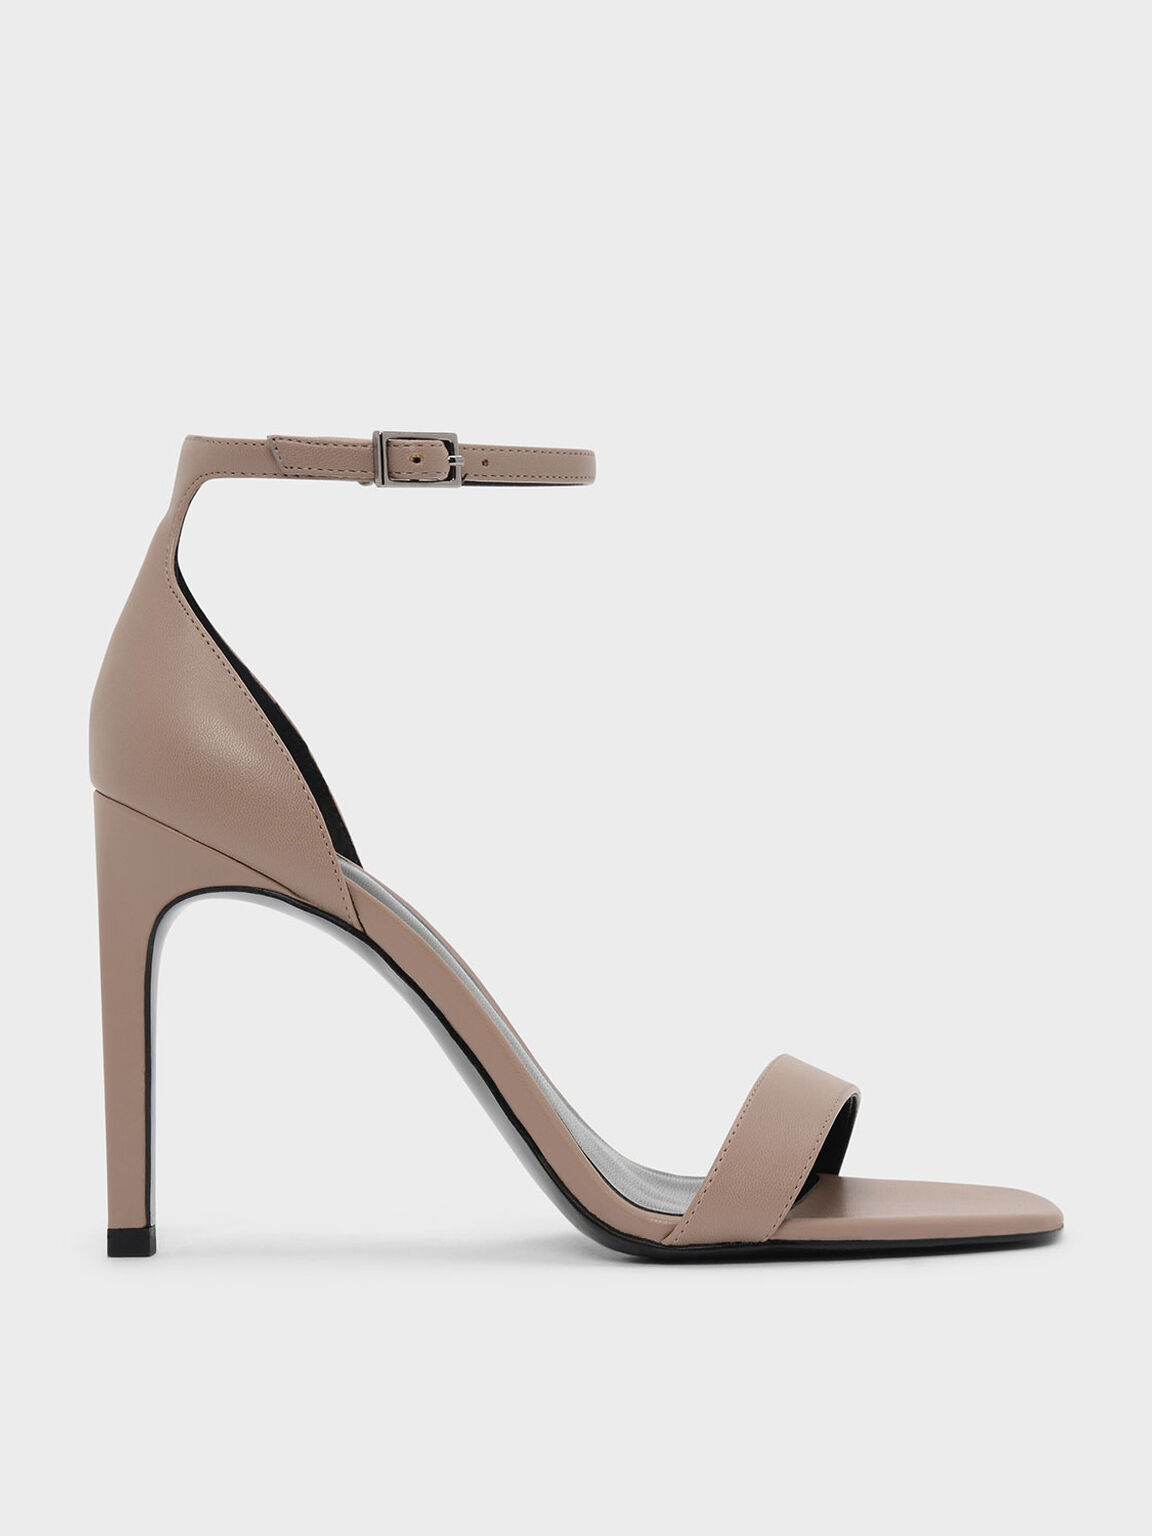 Classic Heeled Sandals, Nude, hi-res